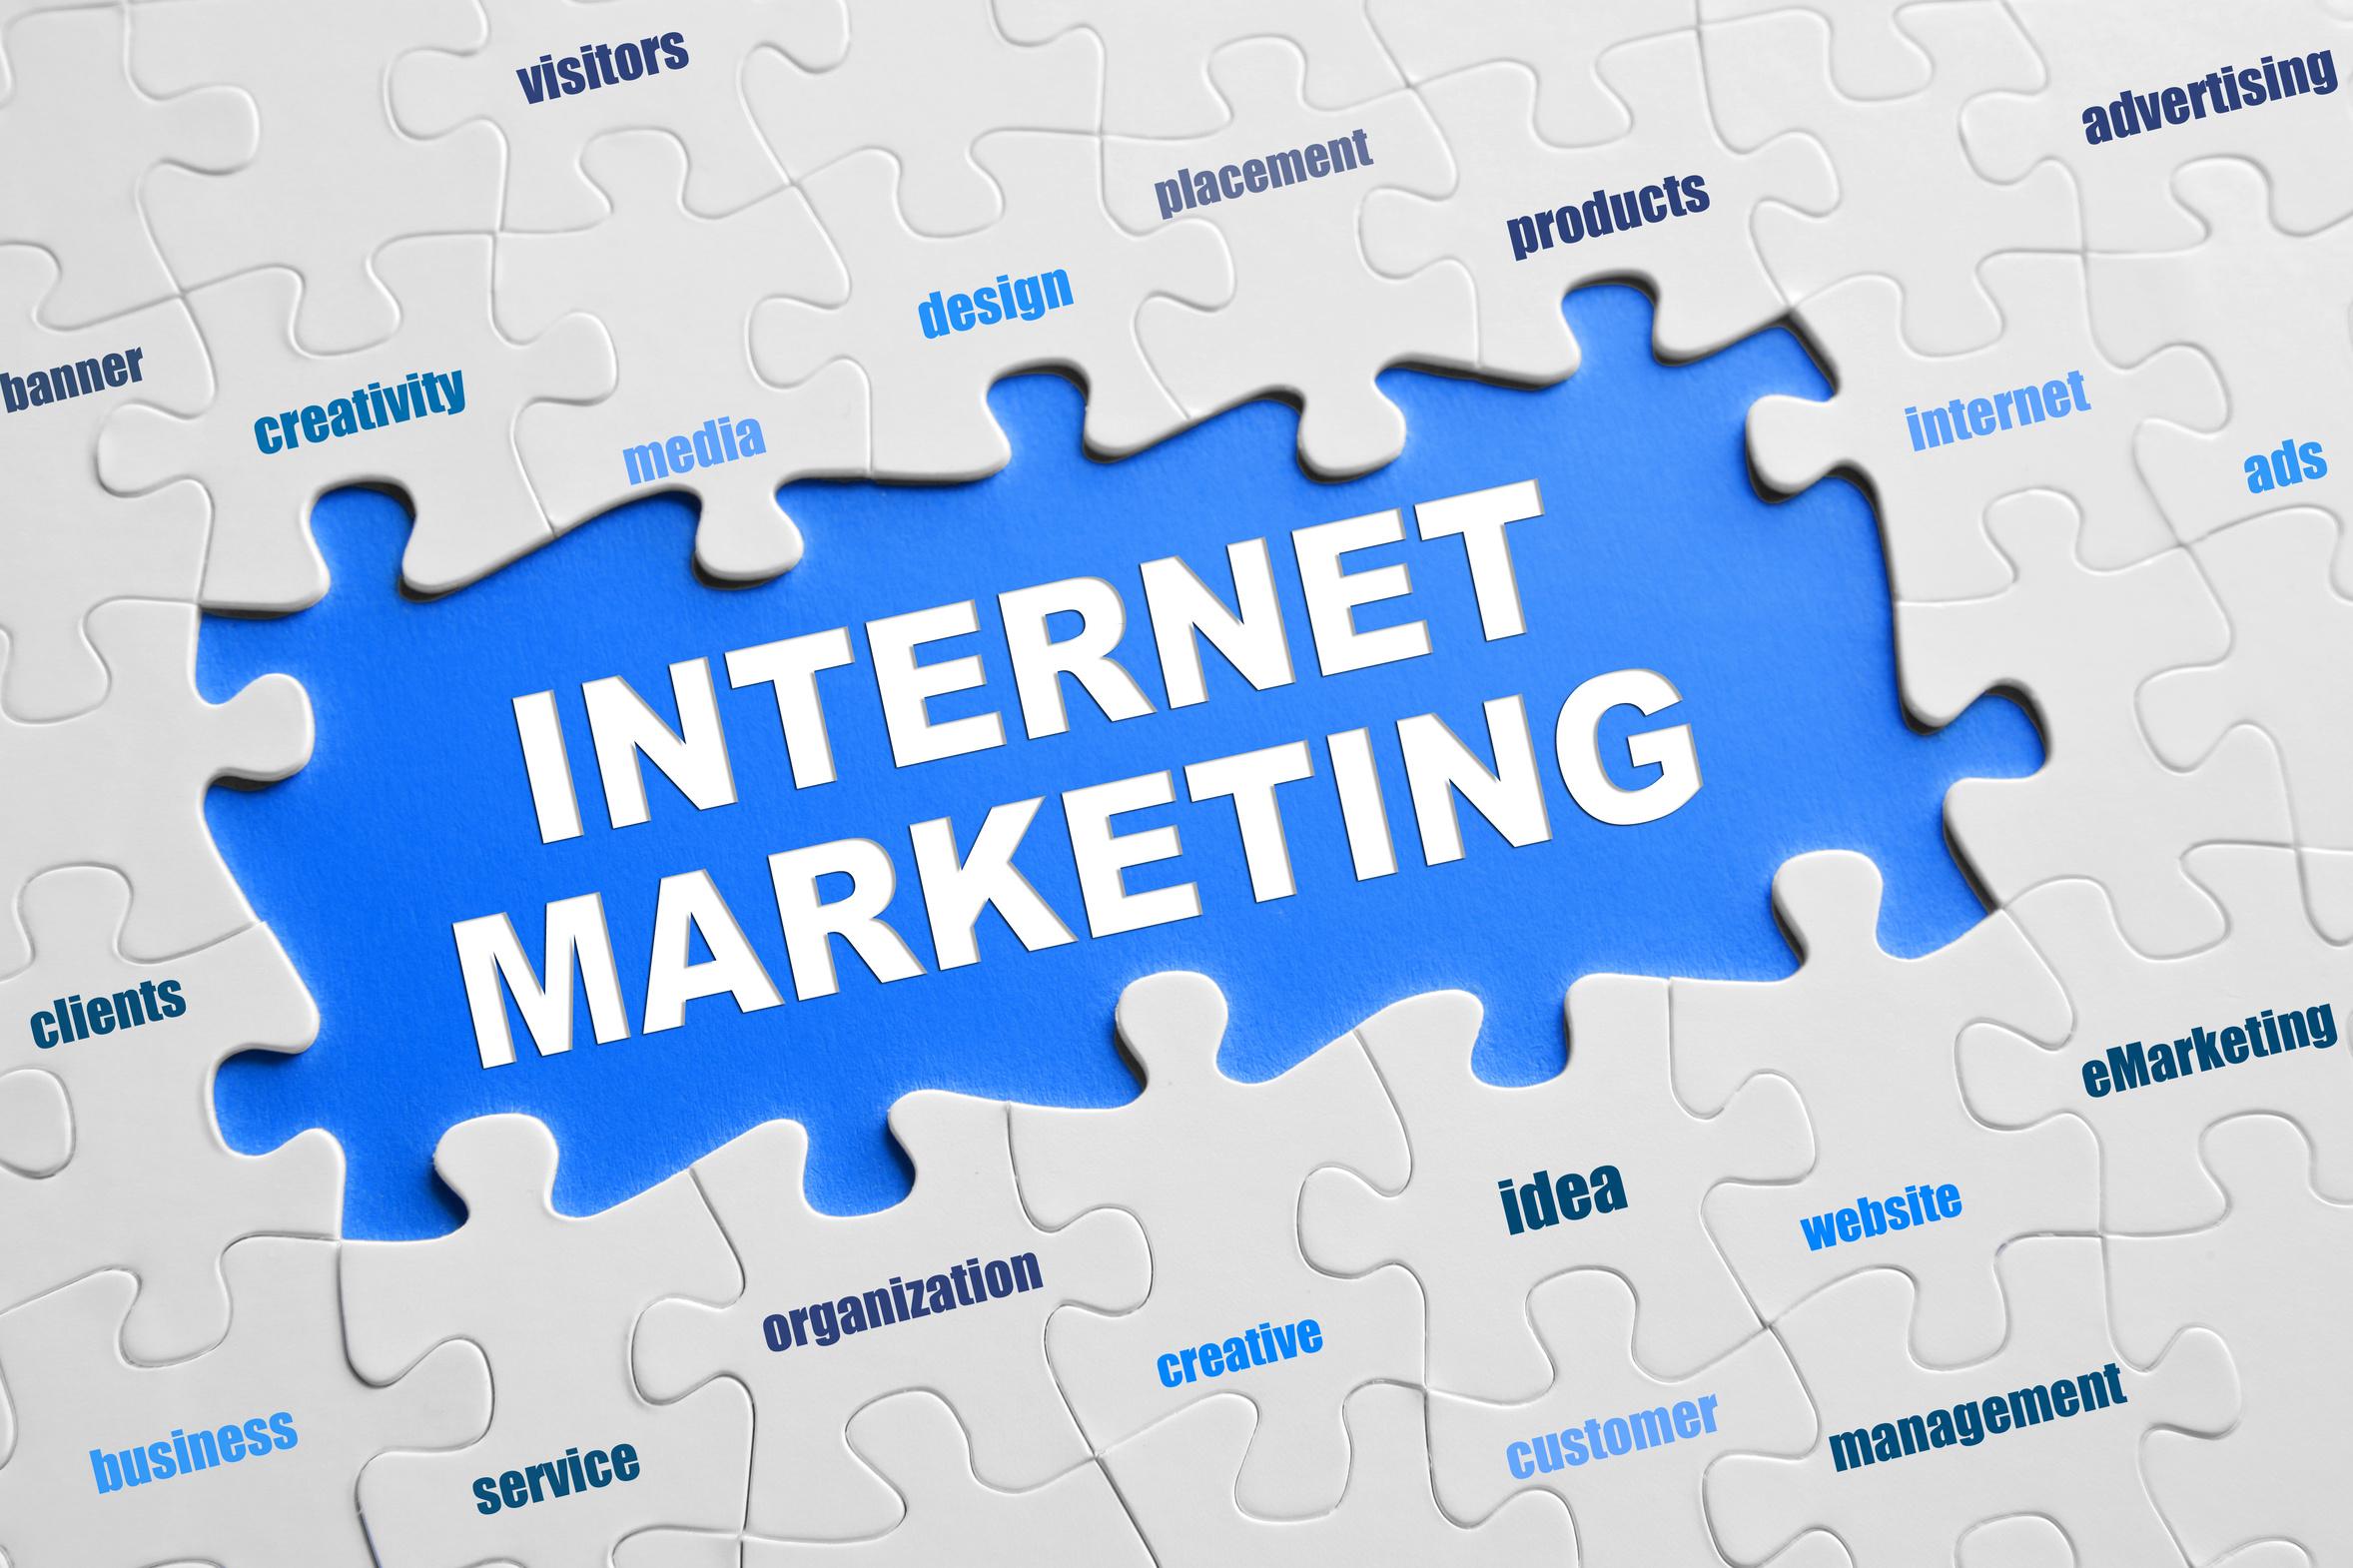 Attitude taken to Succeed in Internet Marketing